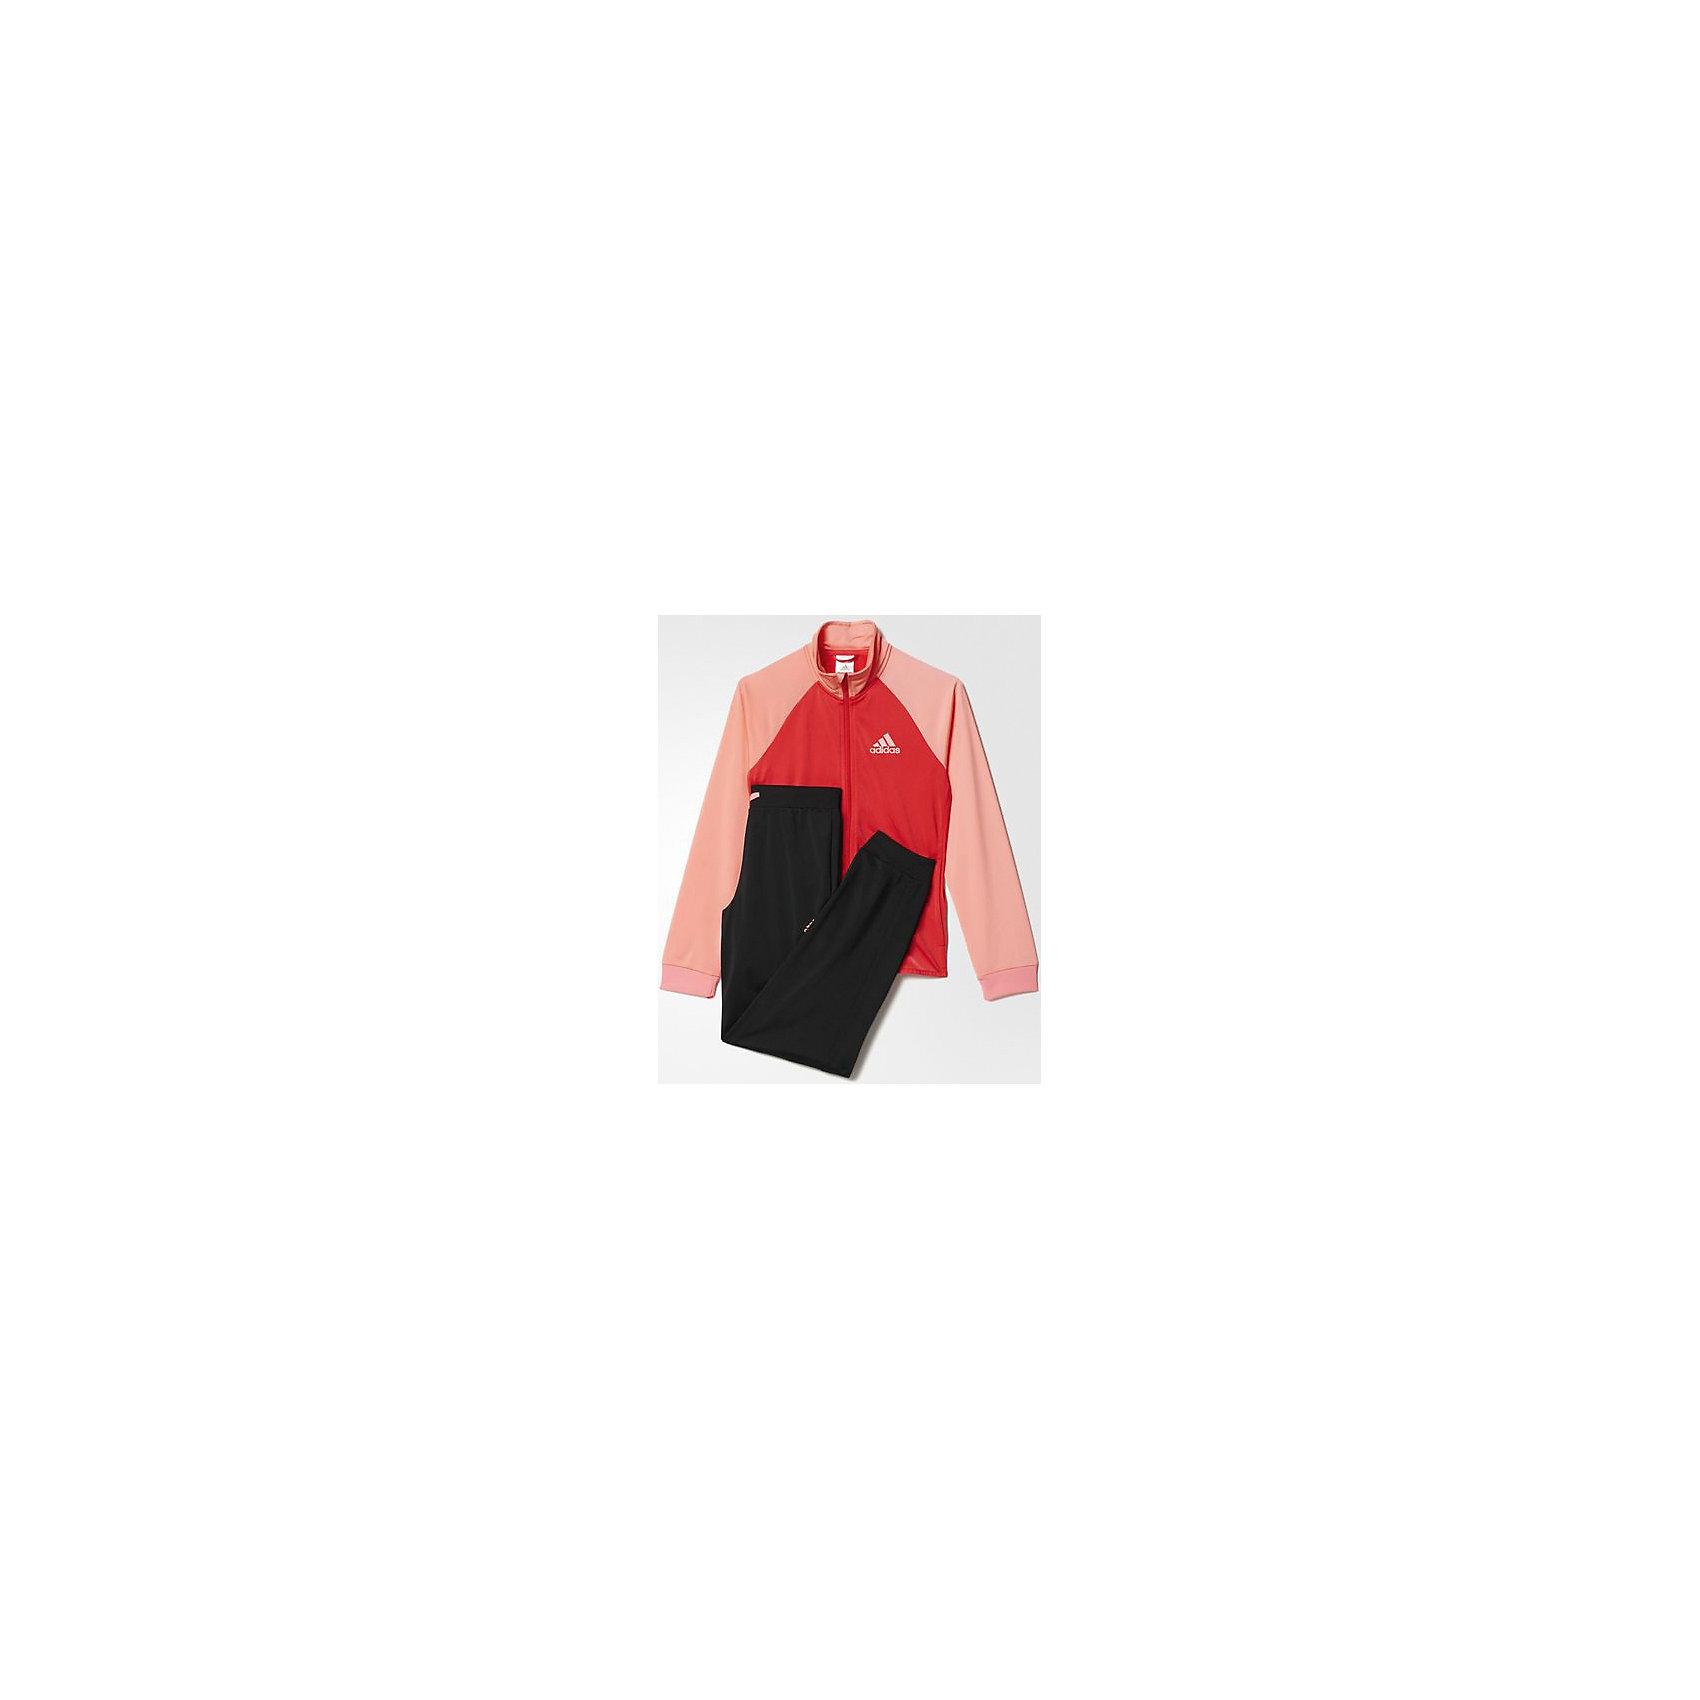 adidas Спортивный костюм Separates adidas женские спортивный костюм bosco sport купить